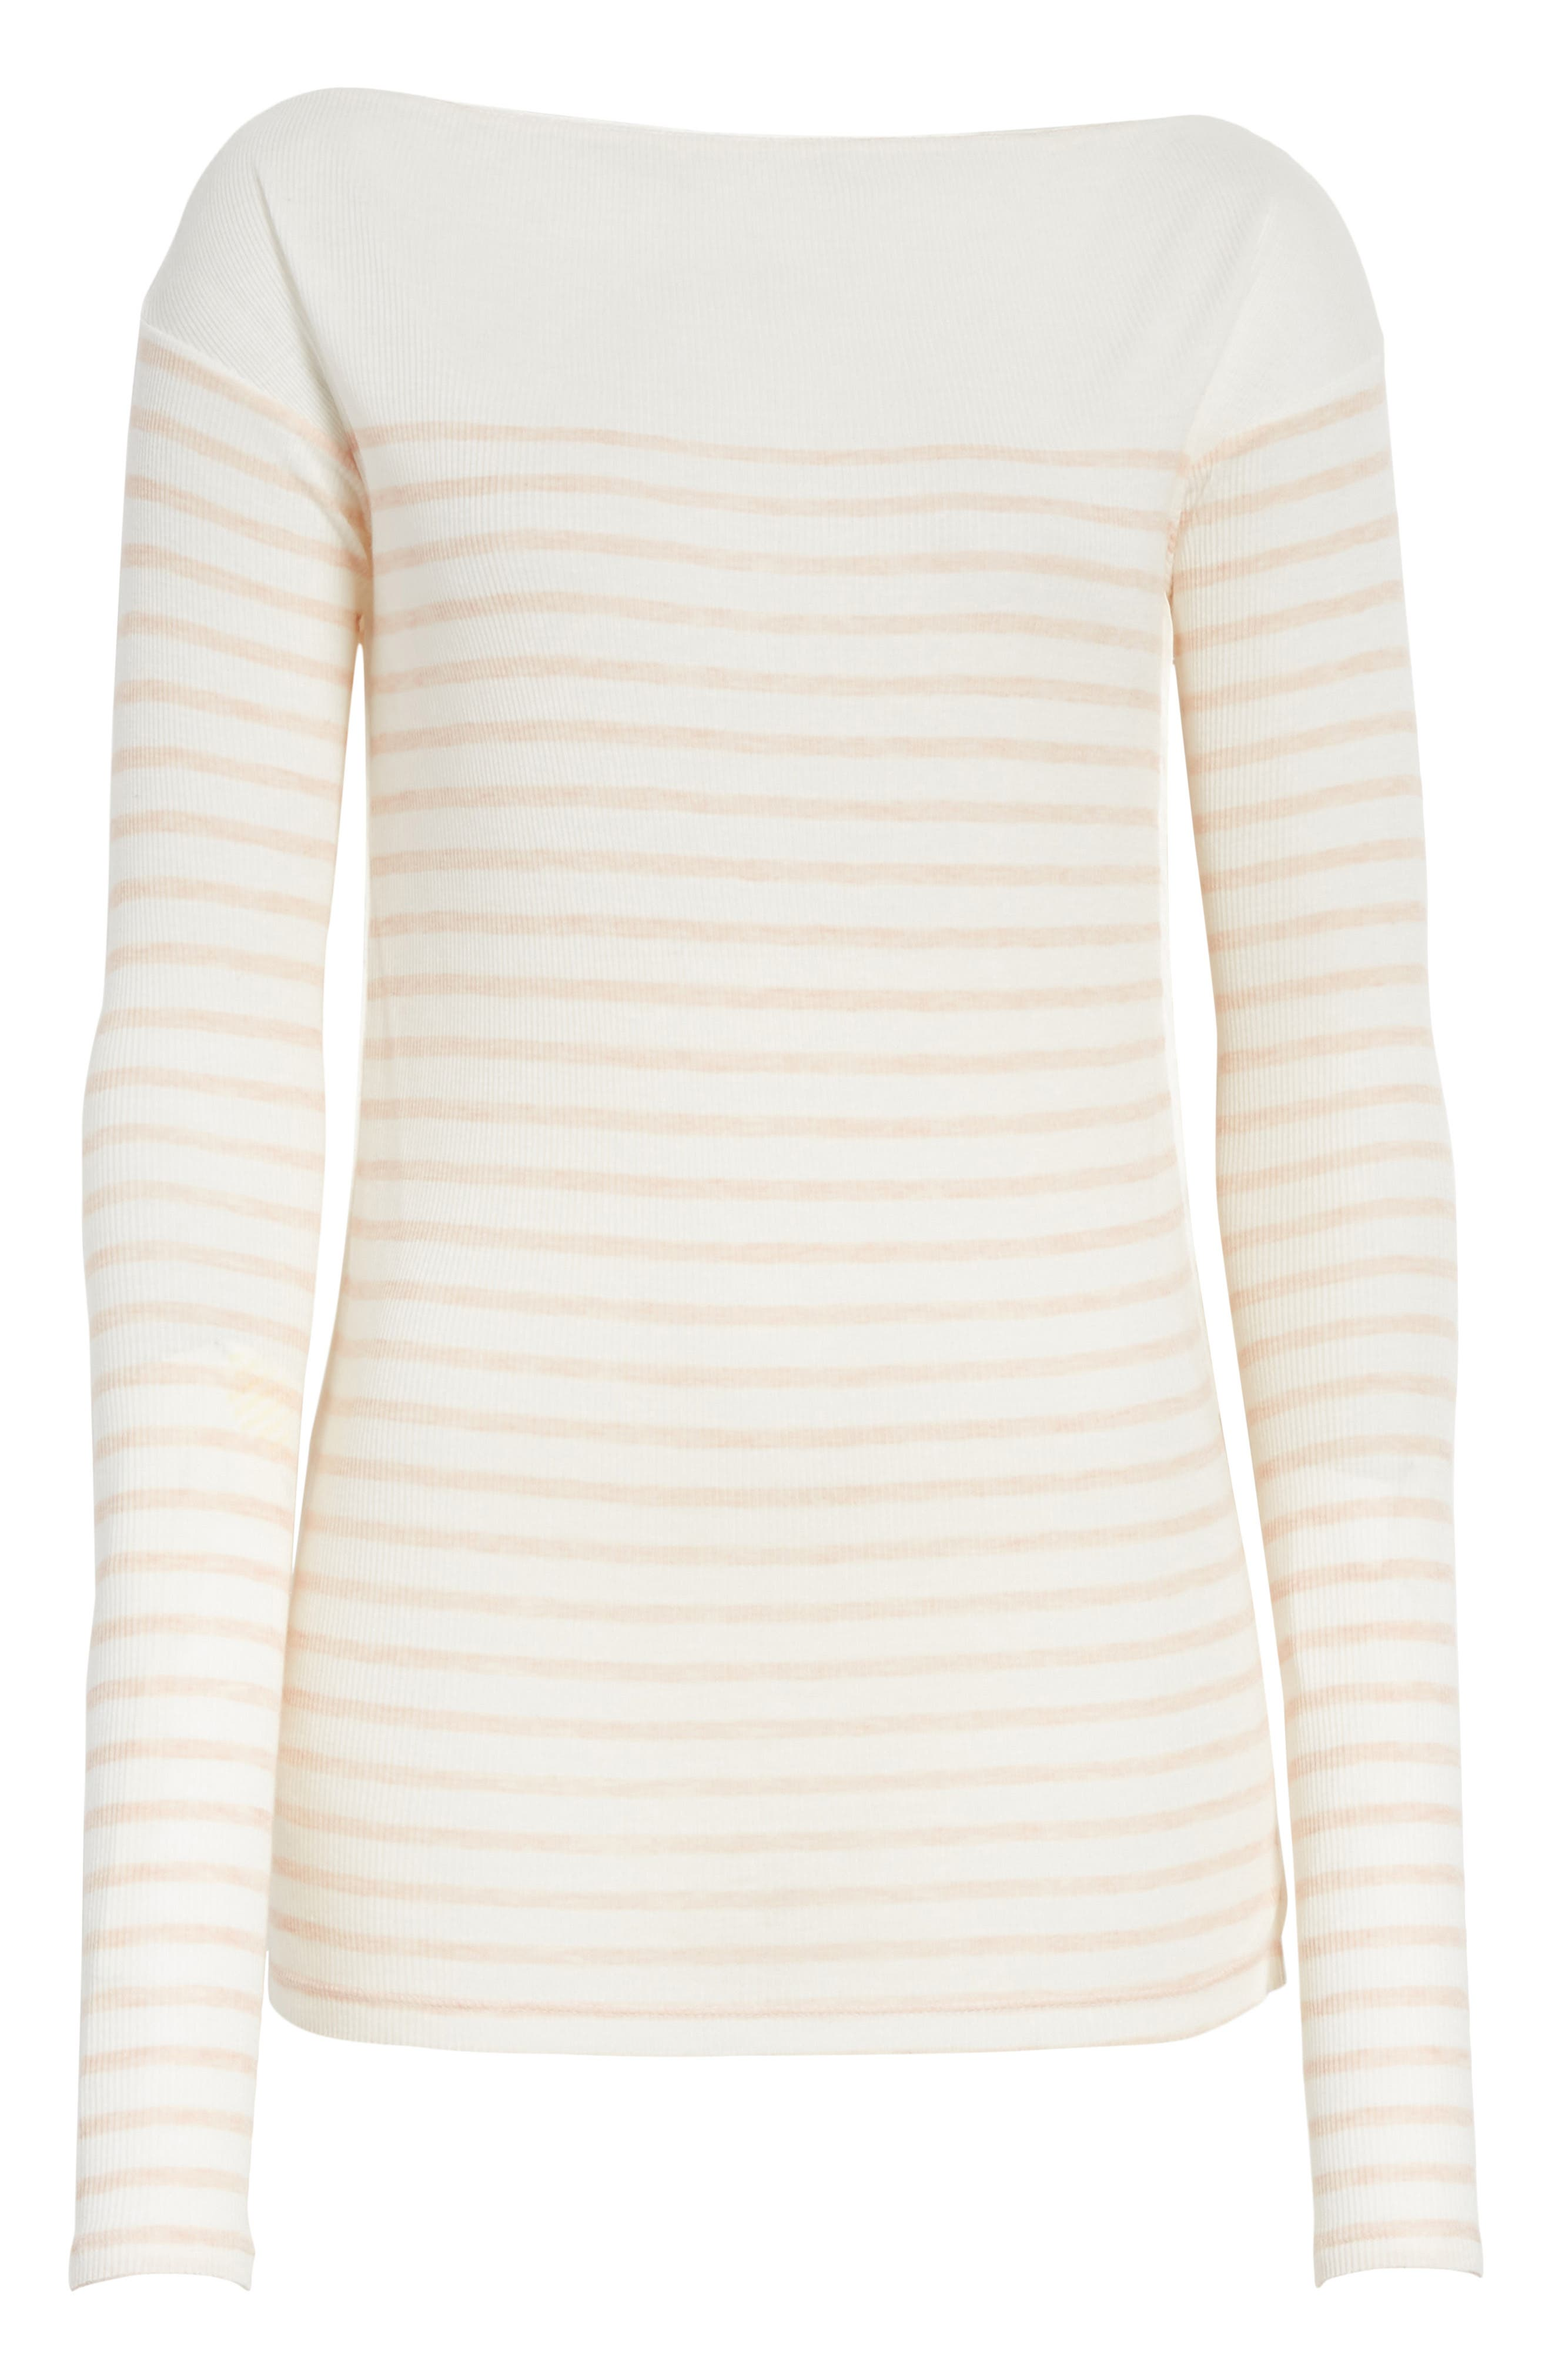 Madison Stripe Long Sleeve Top,                             Alternate thumbnail 6, color,                             900